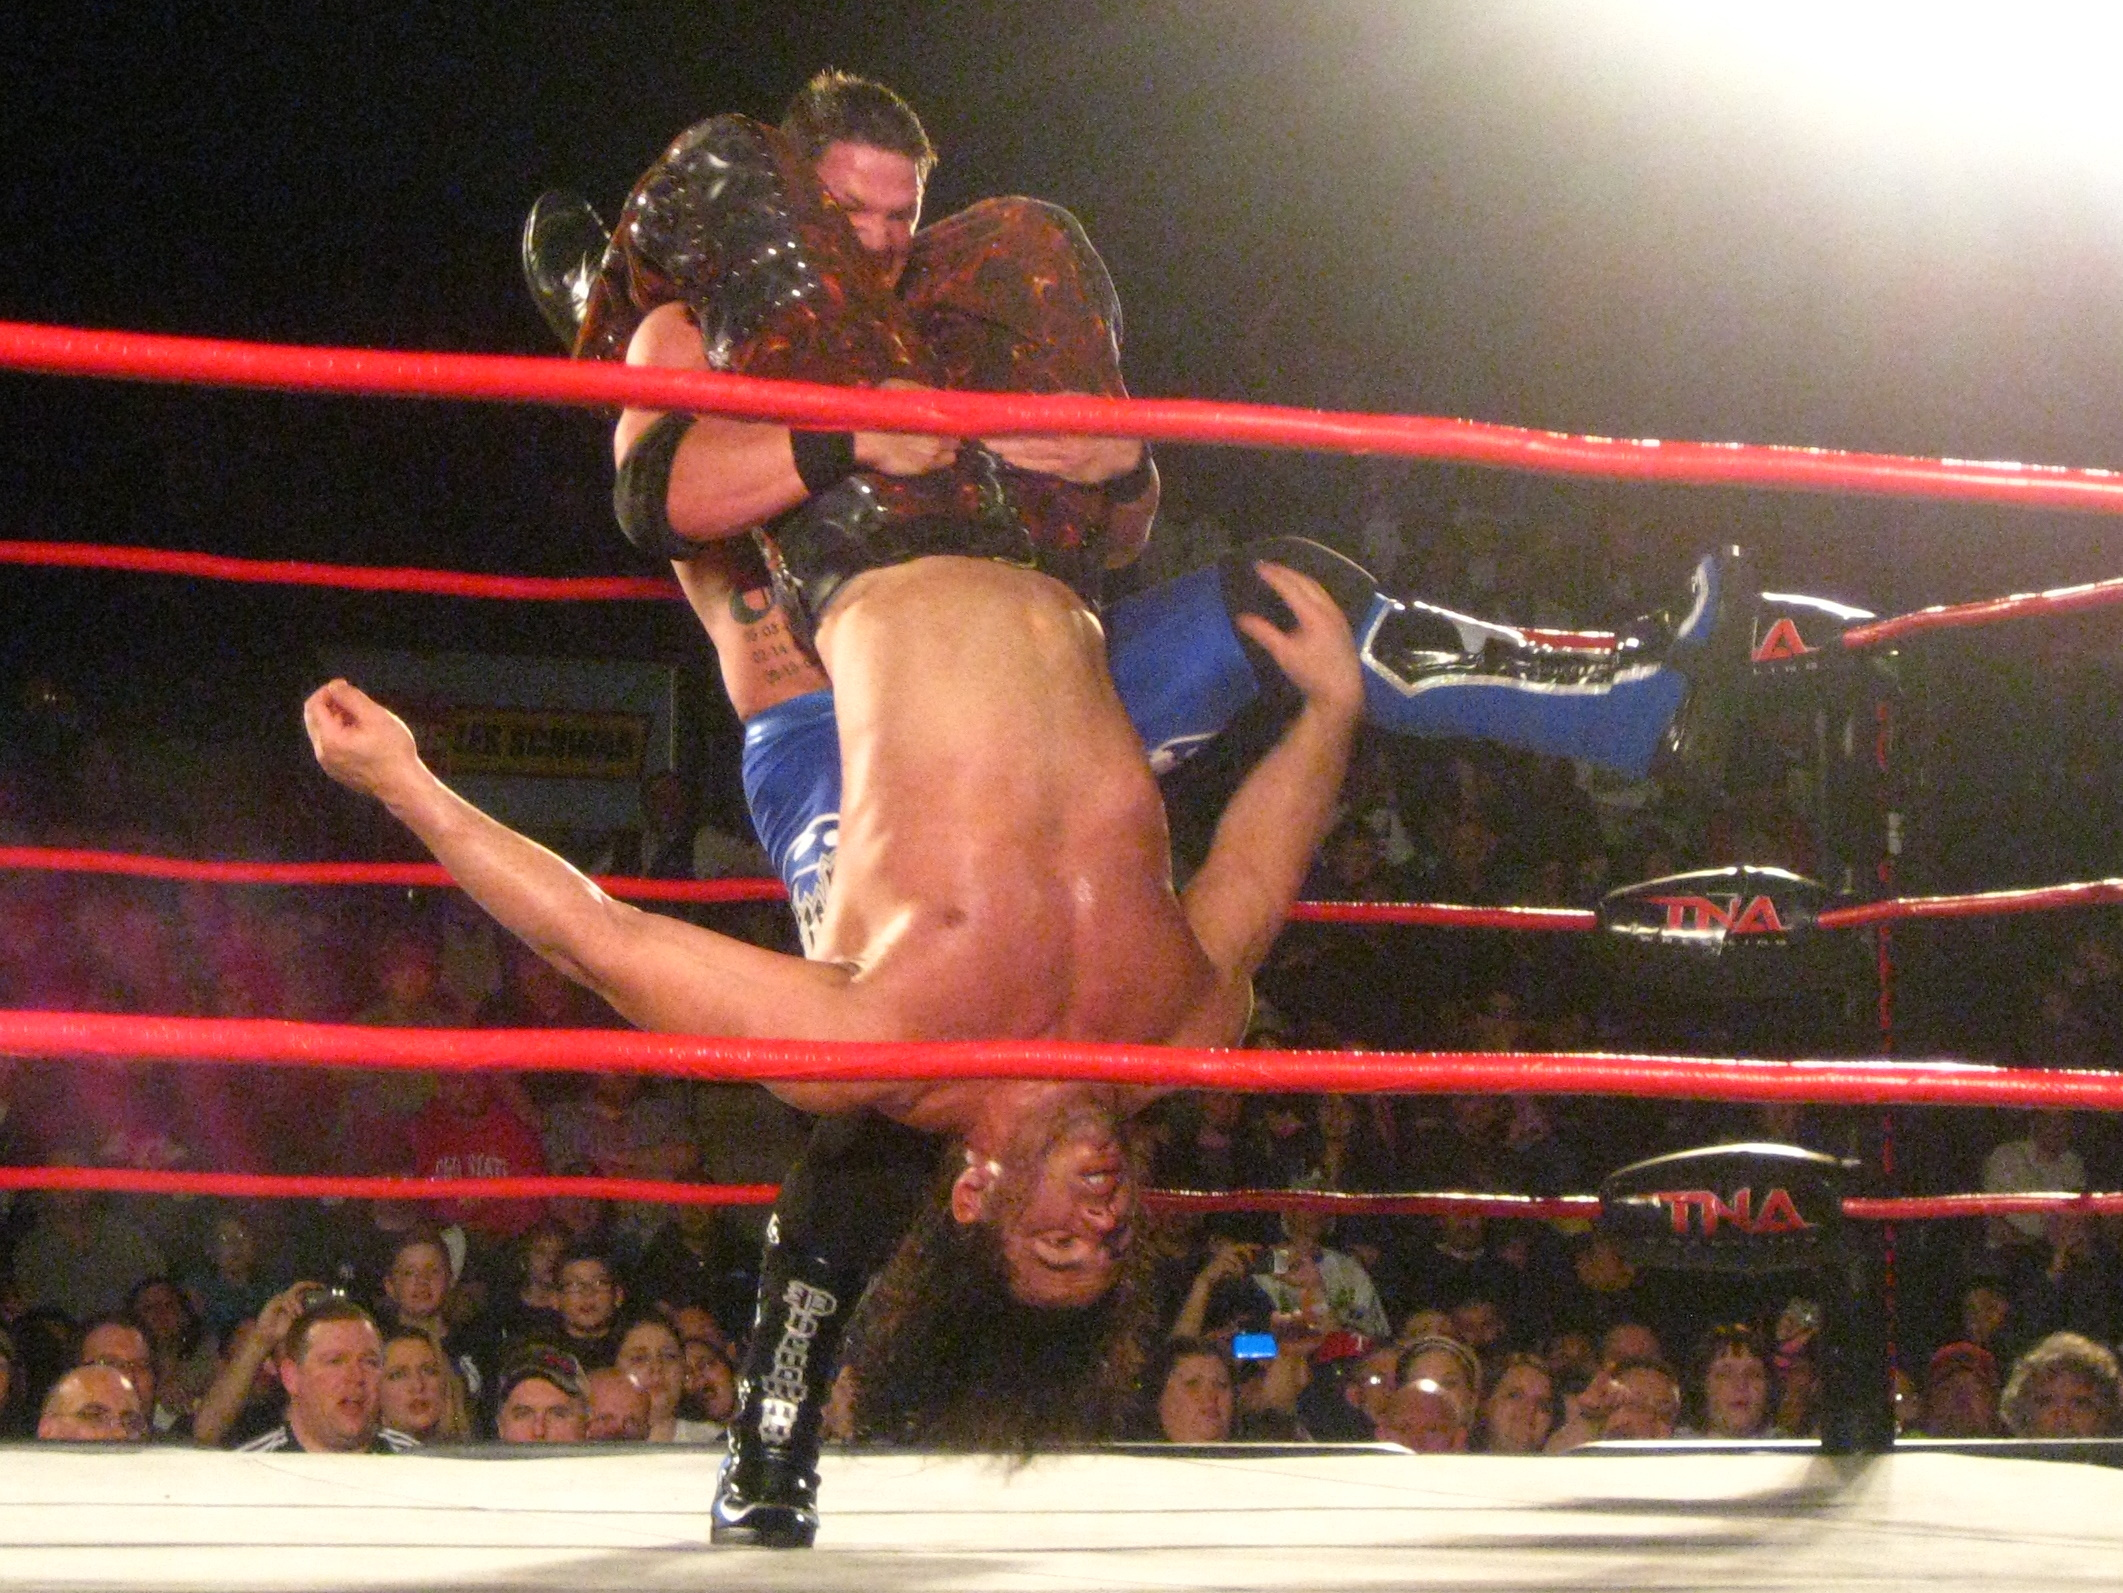 Styles preparing to perform the Styles Clash on Matt Hardy.